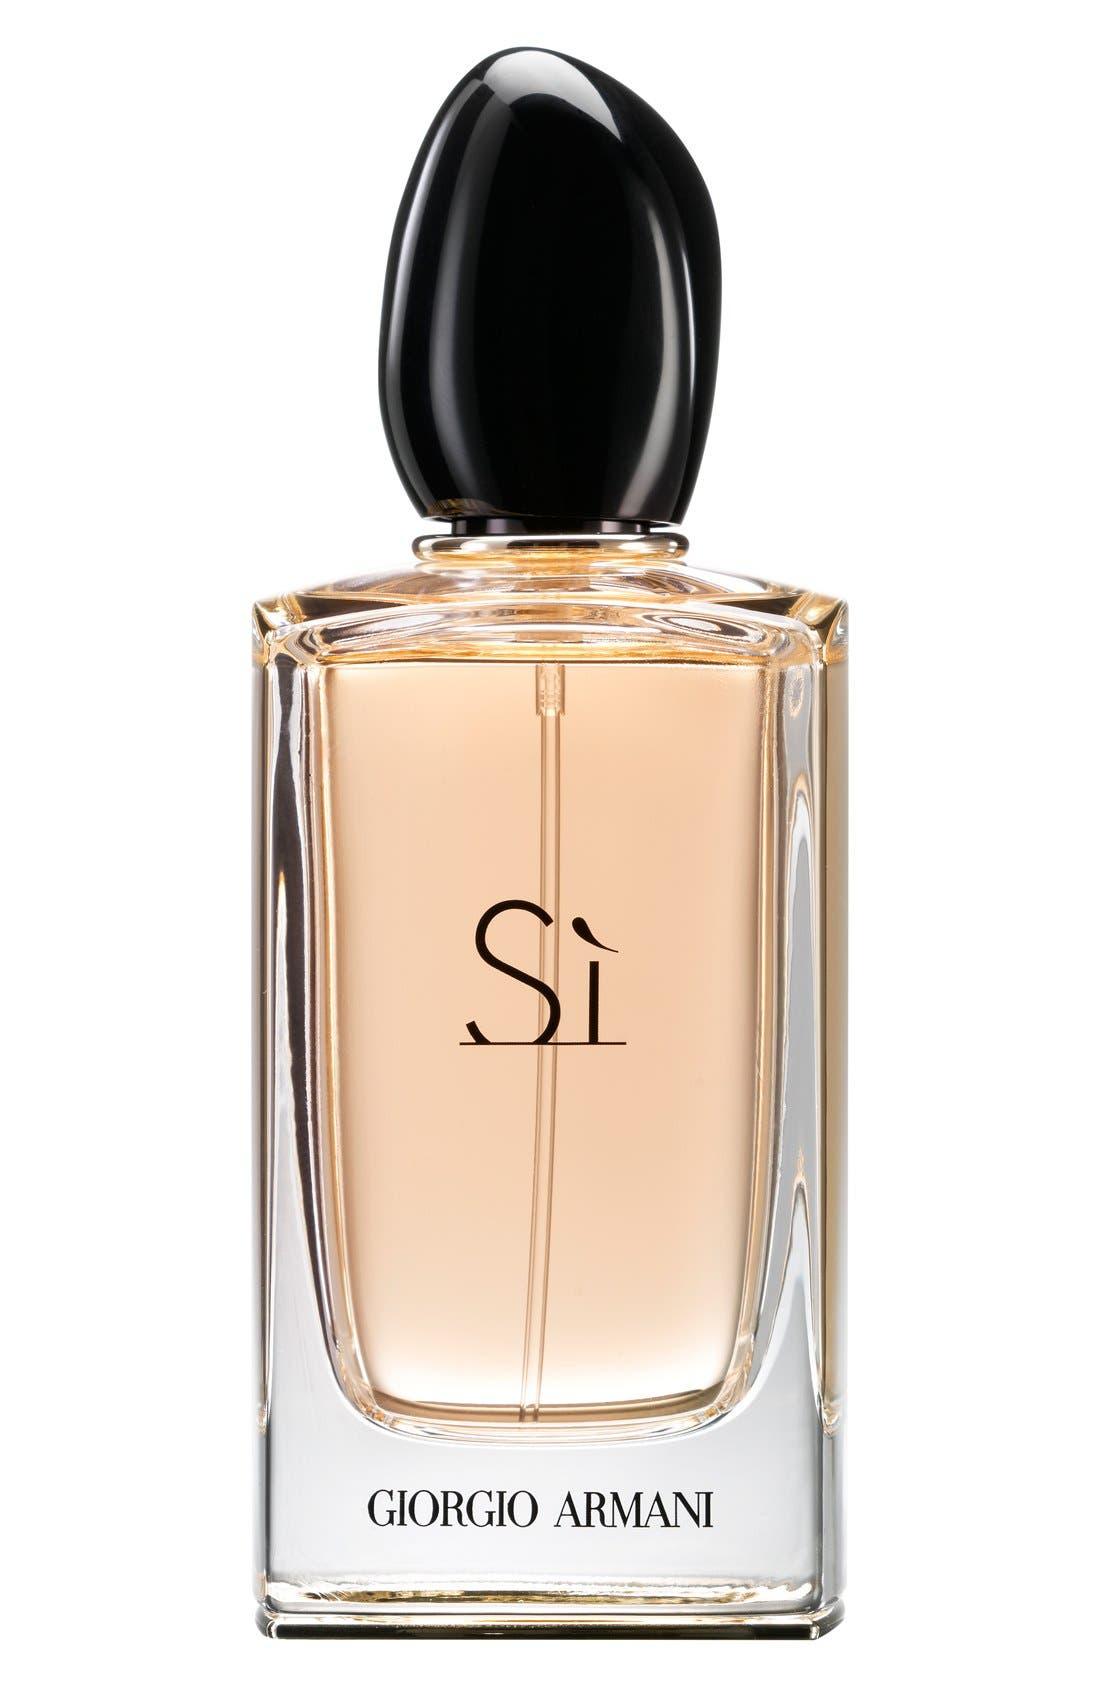 Giorgio Armani 'Si' Eau de Parfum